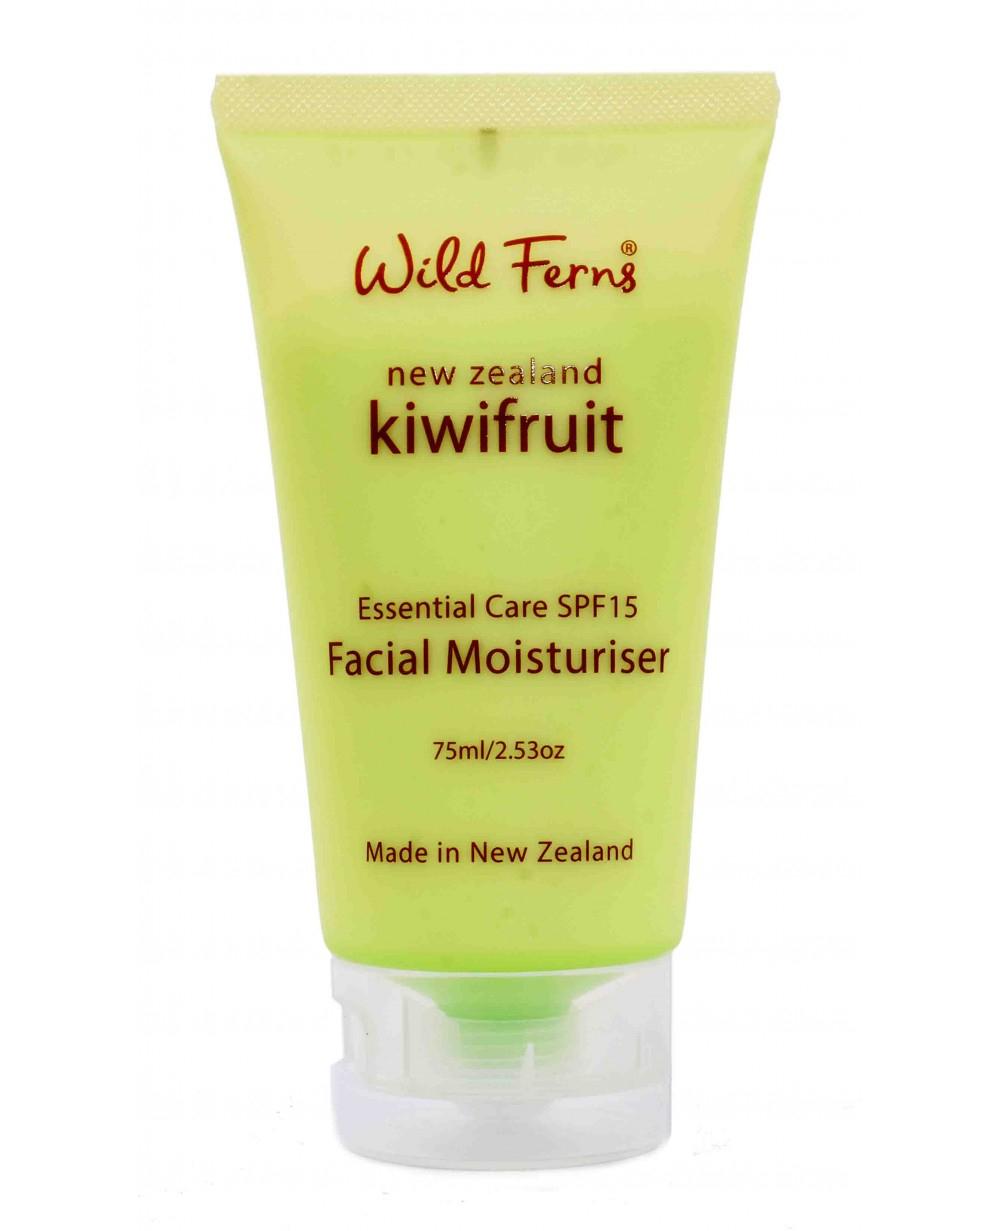 WILD FERNS KIWIFRUIT FACIAL MOISTURISER WITH SPF 15+ 75 ML